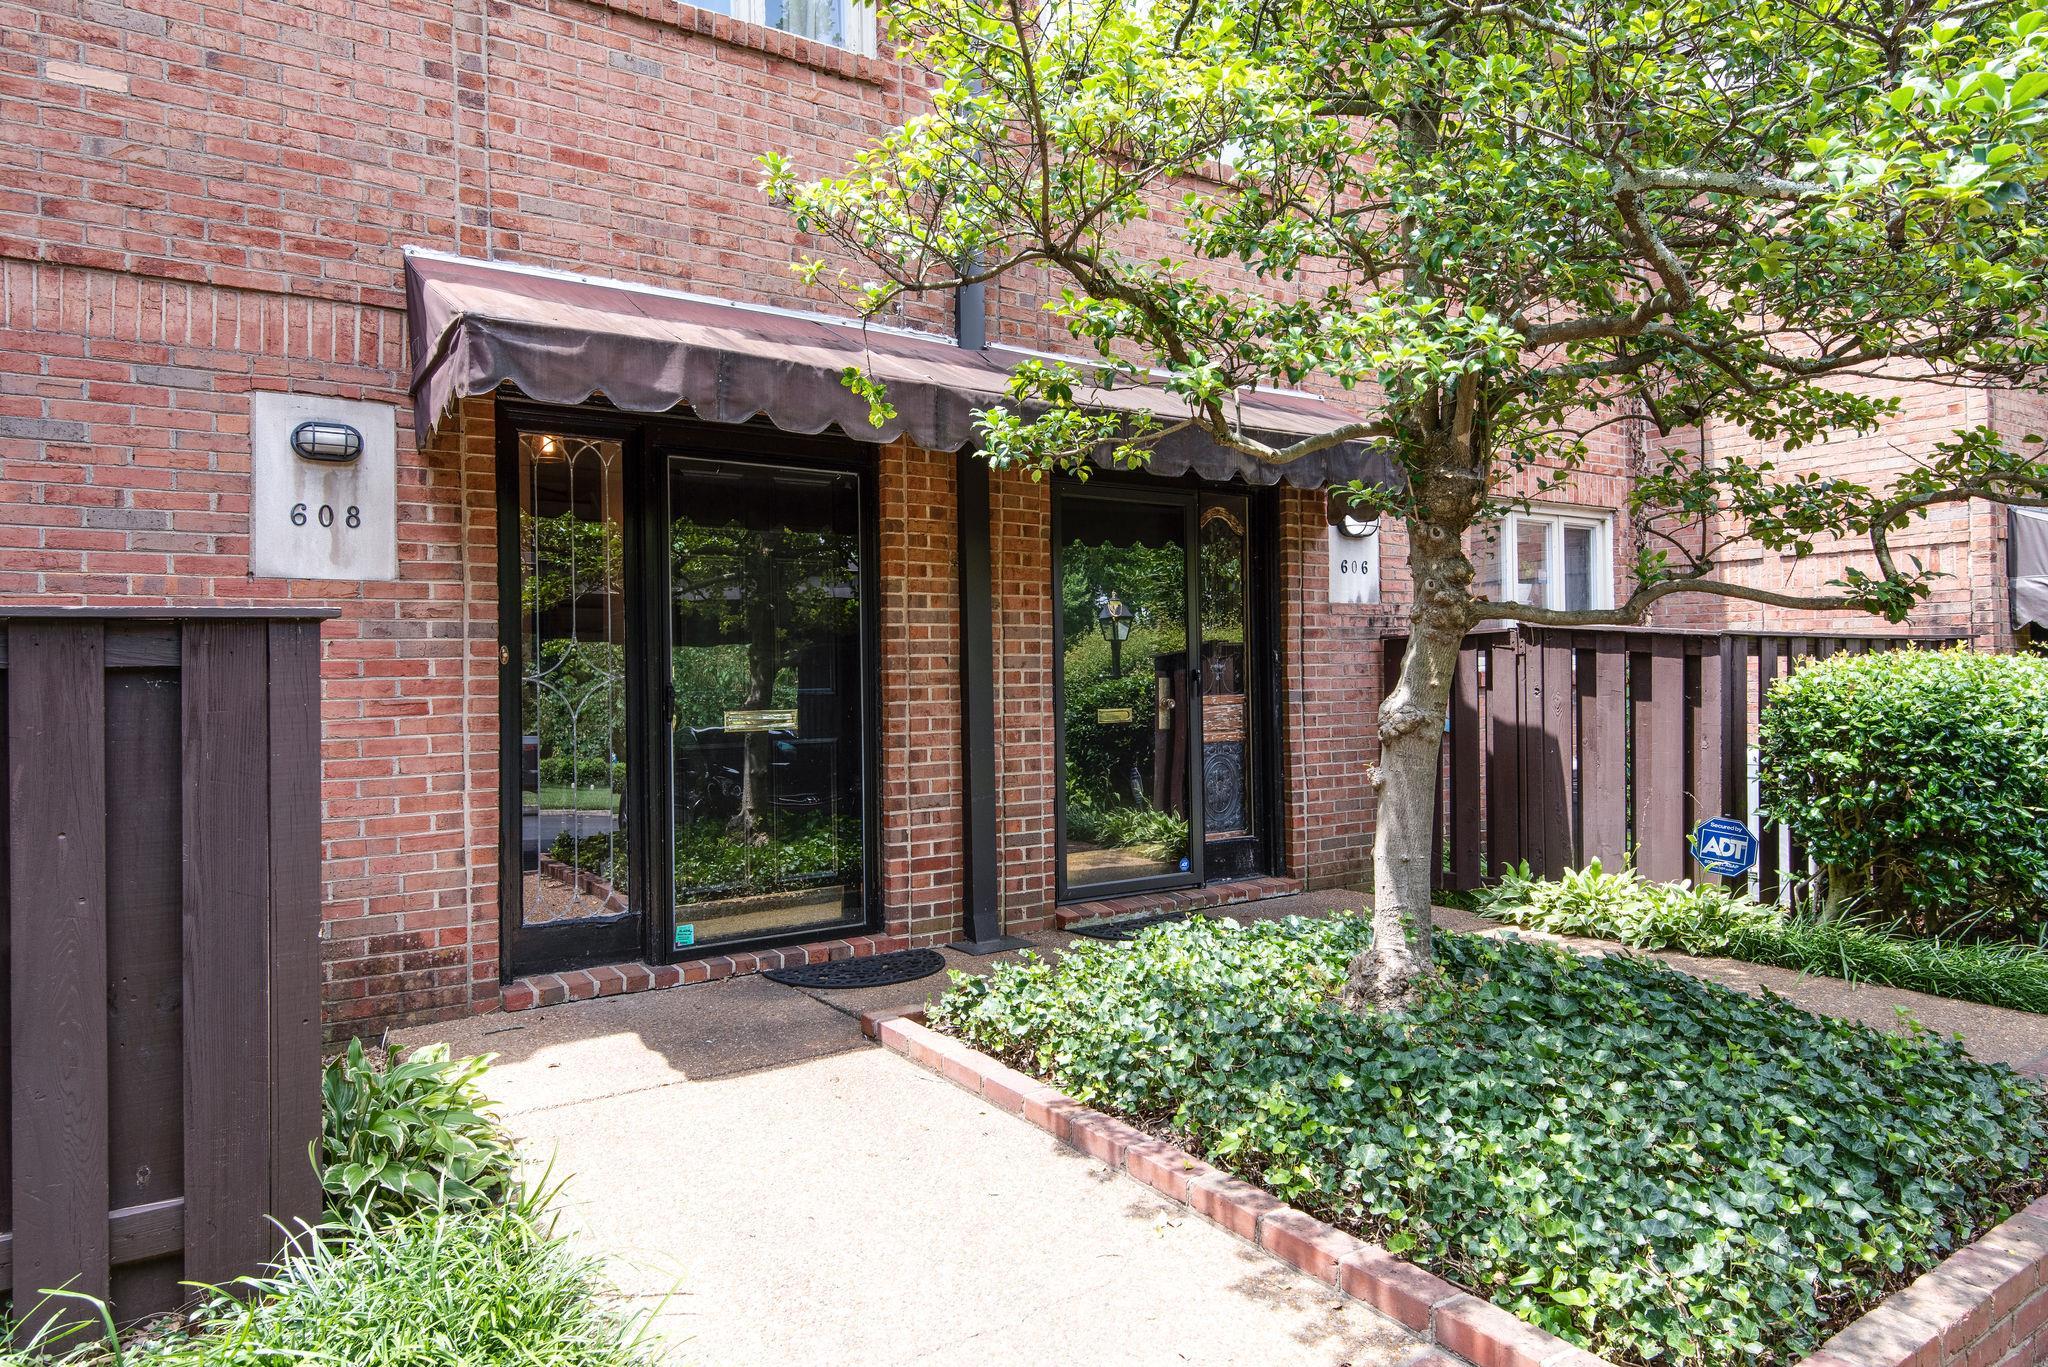 608 Timber Ln, Nashville, TN 37215 - Nashville, TN real estate listing